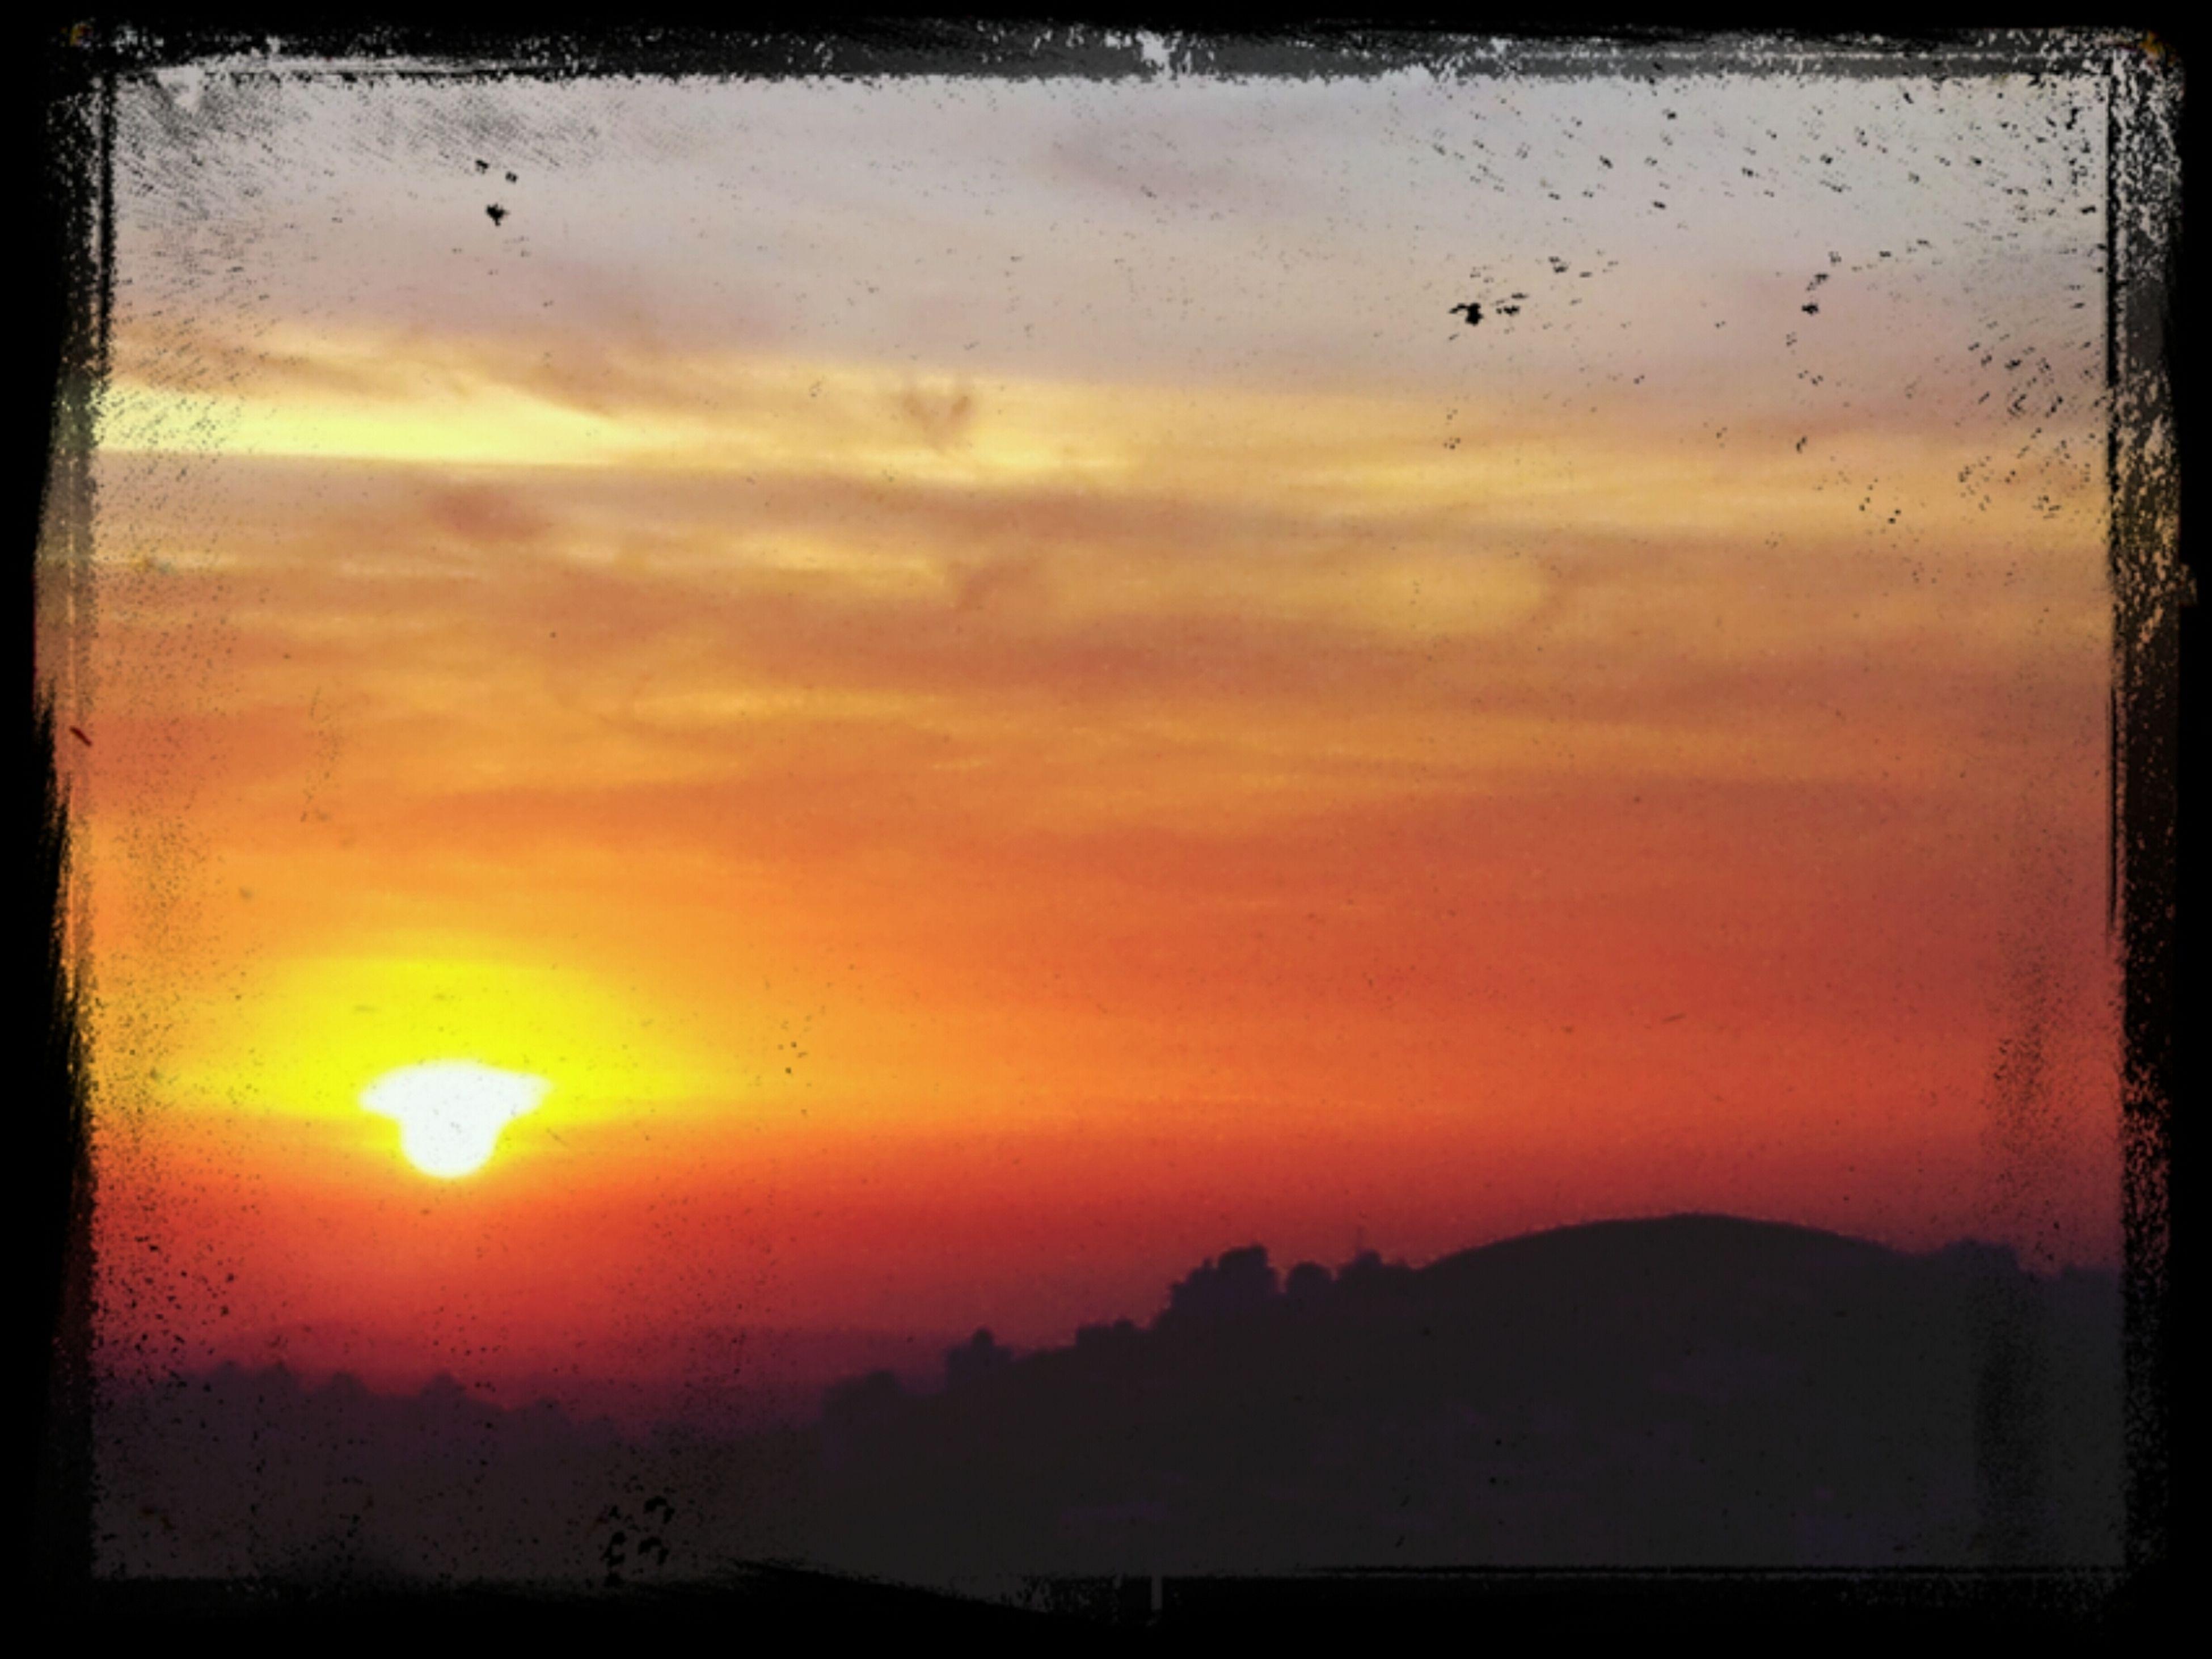 sunset, transfer print, orange color, sky, scenics, silhouette, beauty in nature, tranquil scene, sun, tranquility, auto post production filter, cloud - sky, nature, idyllic, cloud, landscape, dramatic sky, outdoors, sunlight, no people